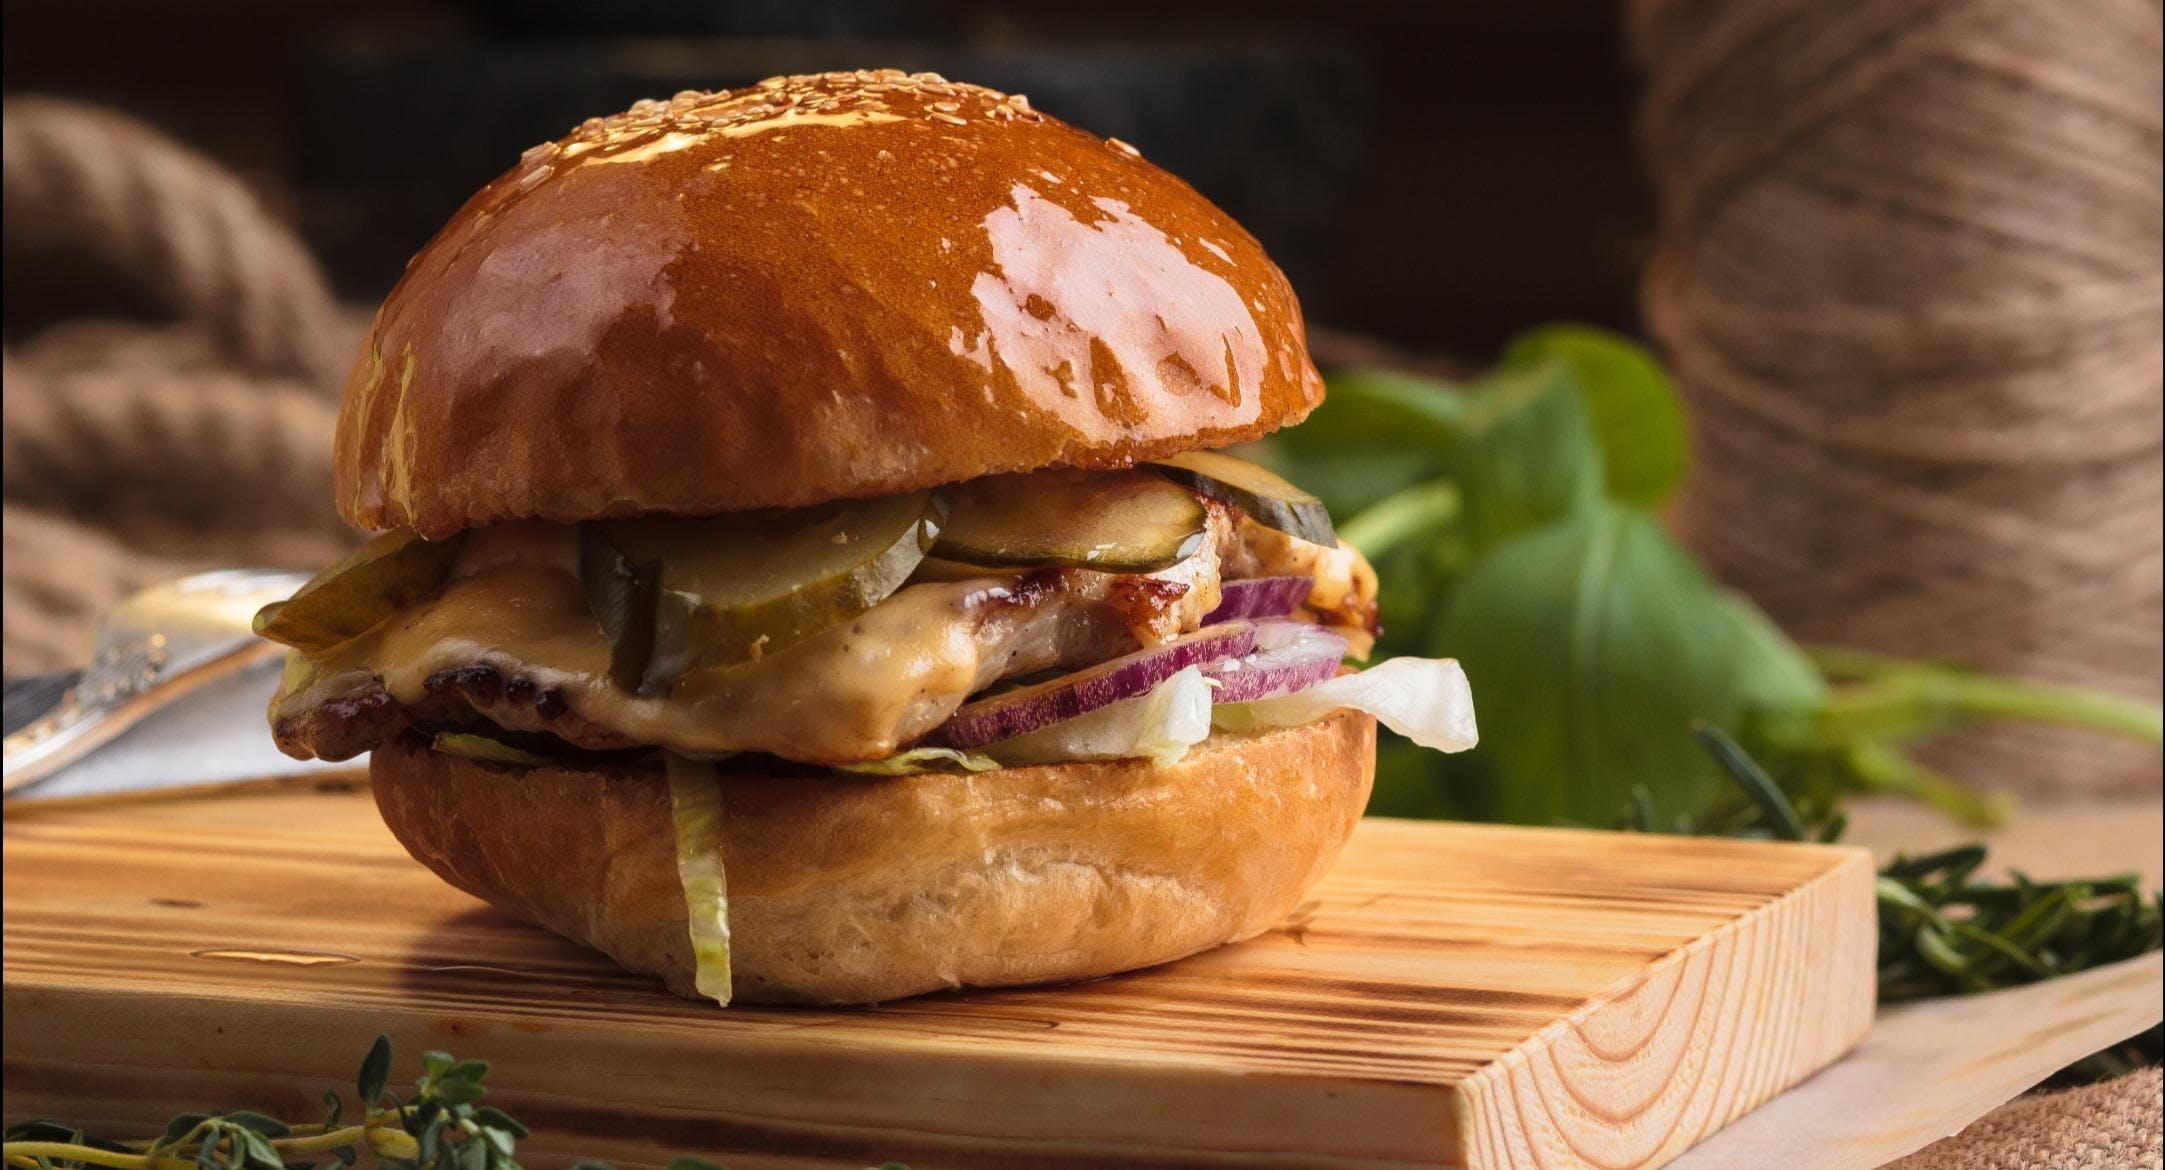 Tru Burger Birmingham image 2